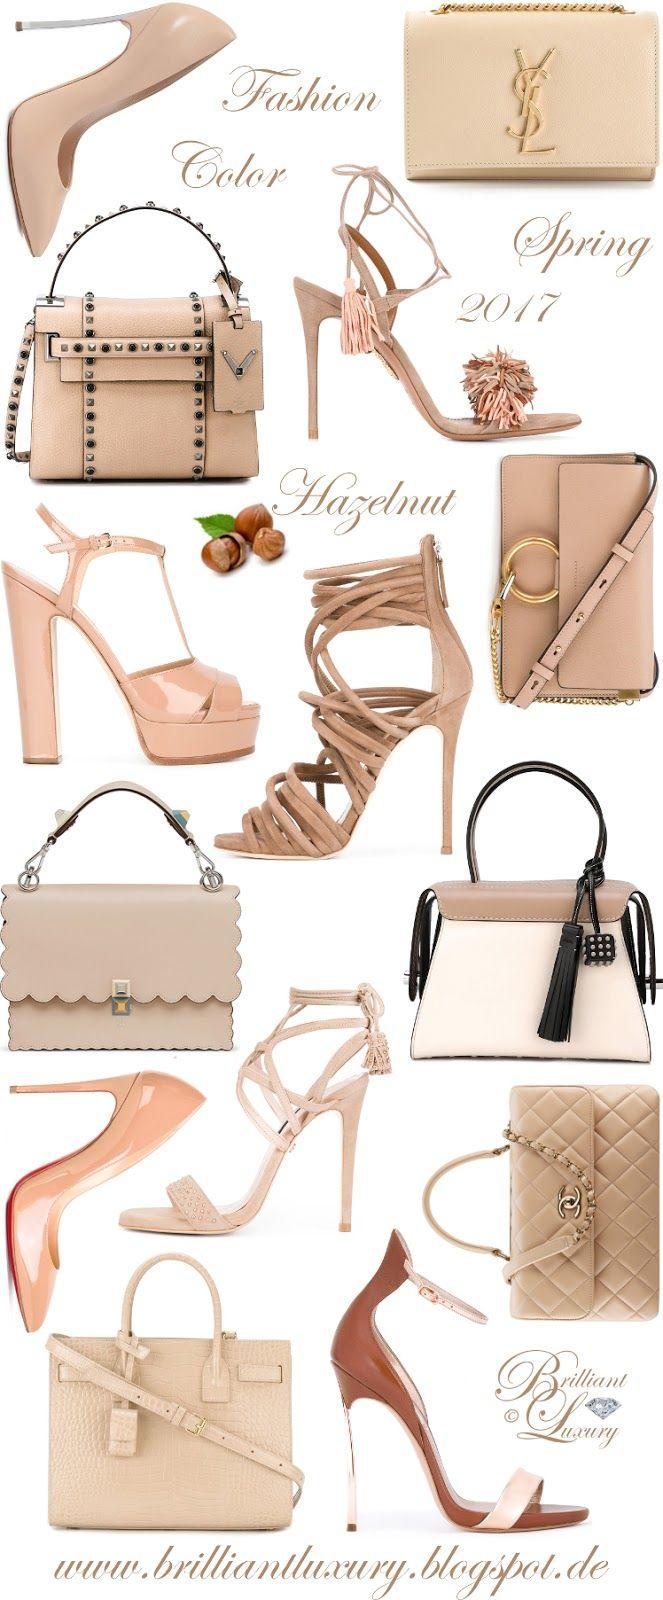 Brilliant Luxury ♦ Fashion Color Spring 2017 ~ hazelnut